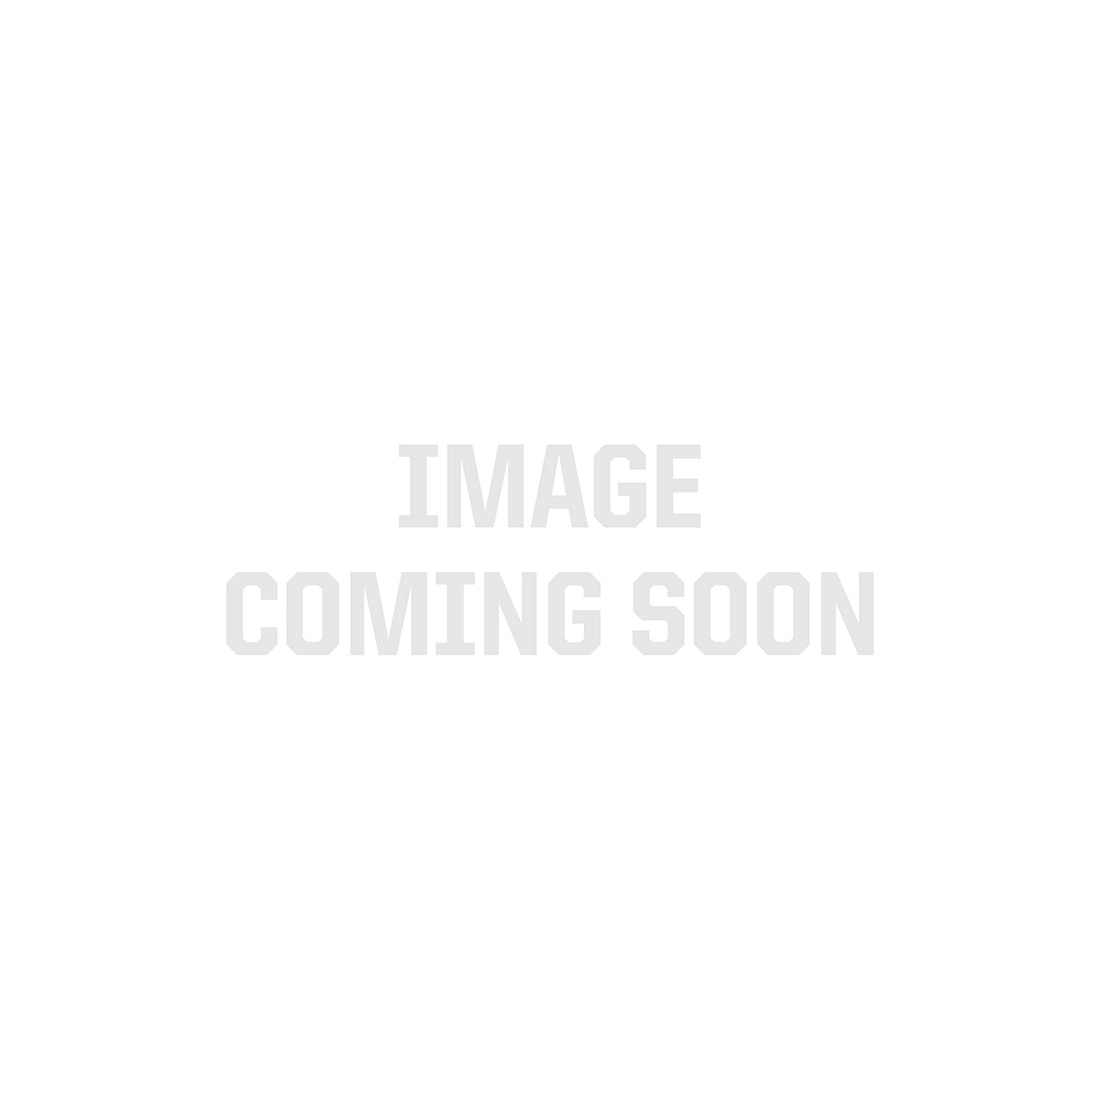 White Adjustable 3528 Single Row LED Strip Light, 120/m, 10mm wide, Sample Kit